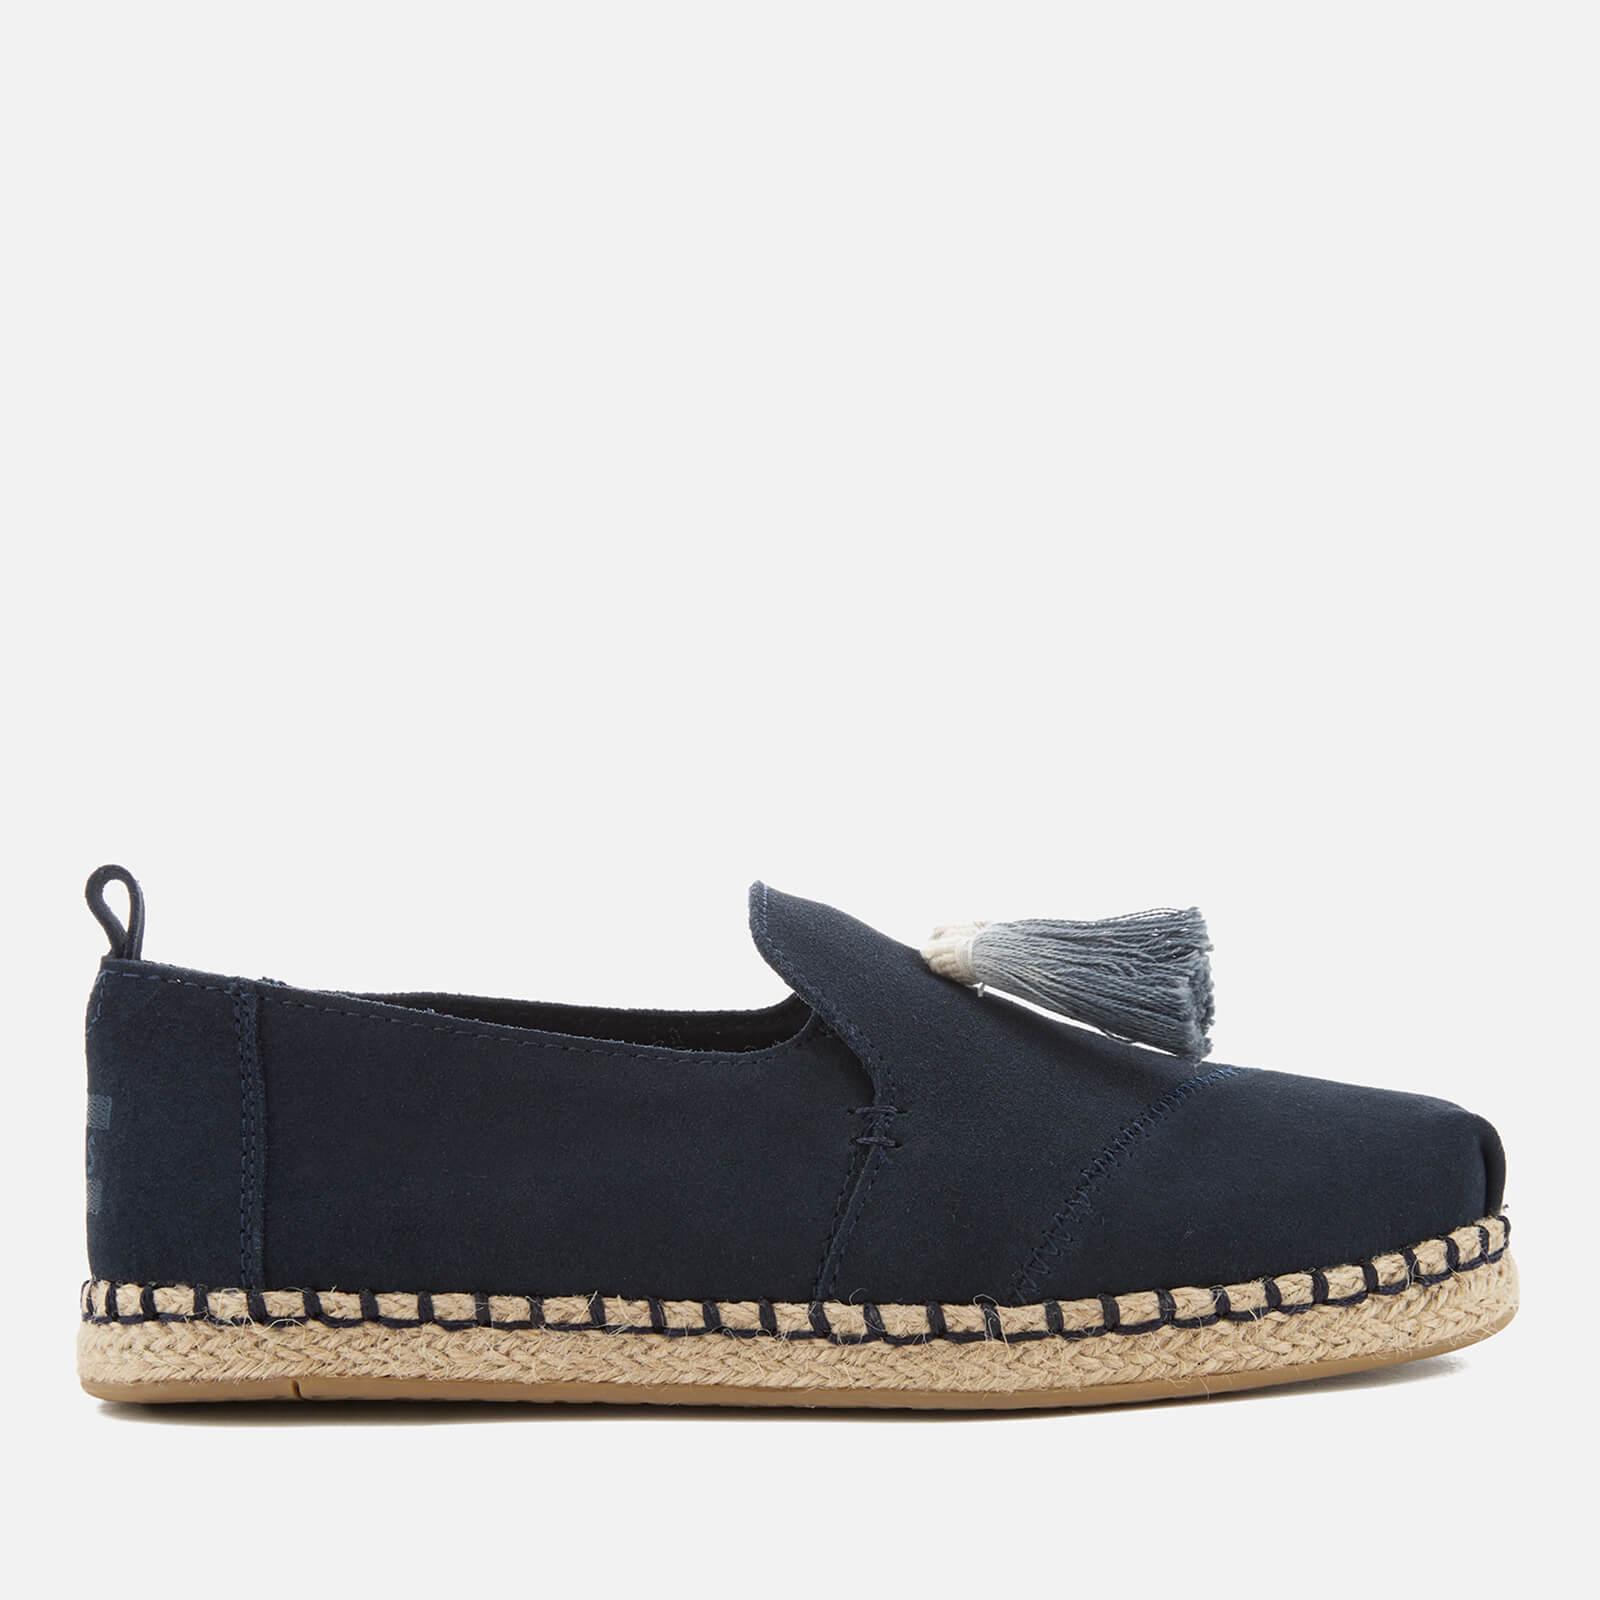 9f34810be43 TOMS Women s Deconstructed Alpargata Suede Espadrilles - Navy Womens  Footwear